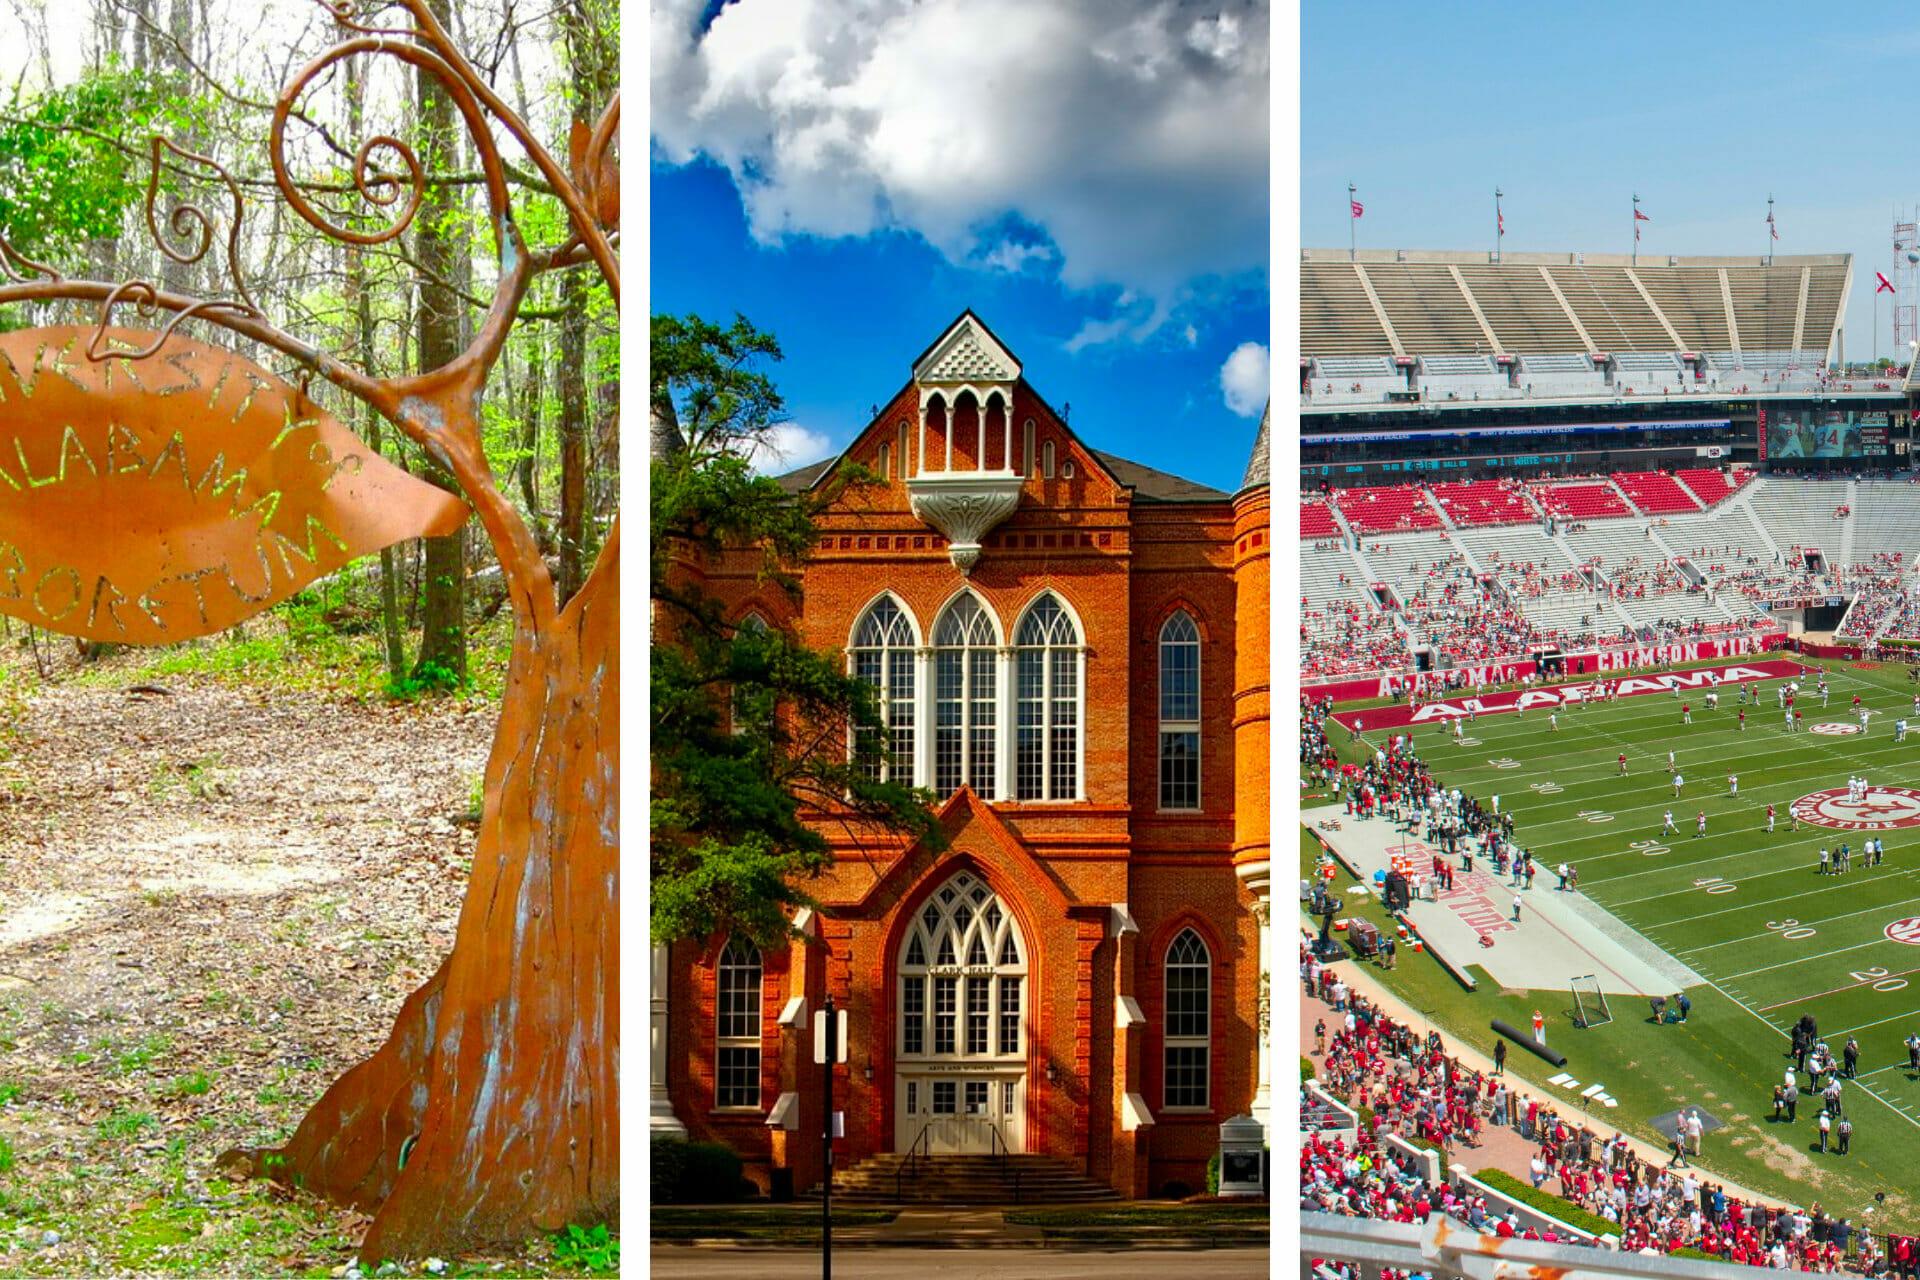 21 Perfect Things to Do in Tuscaloosa, Alabama (+ Travel Guide!) via @allamericanatlas